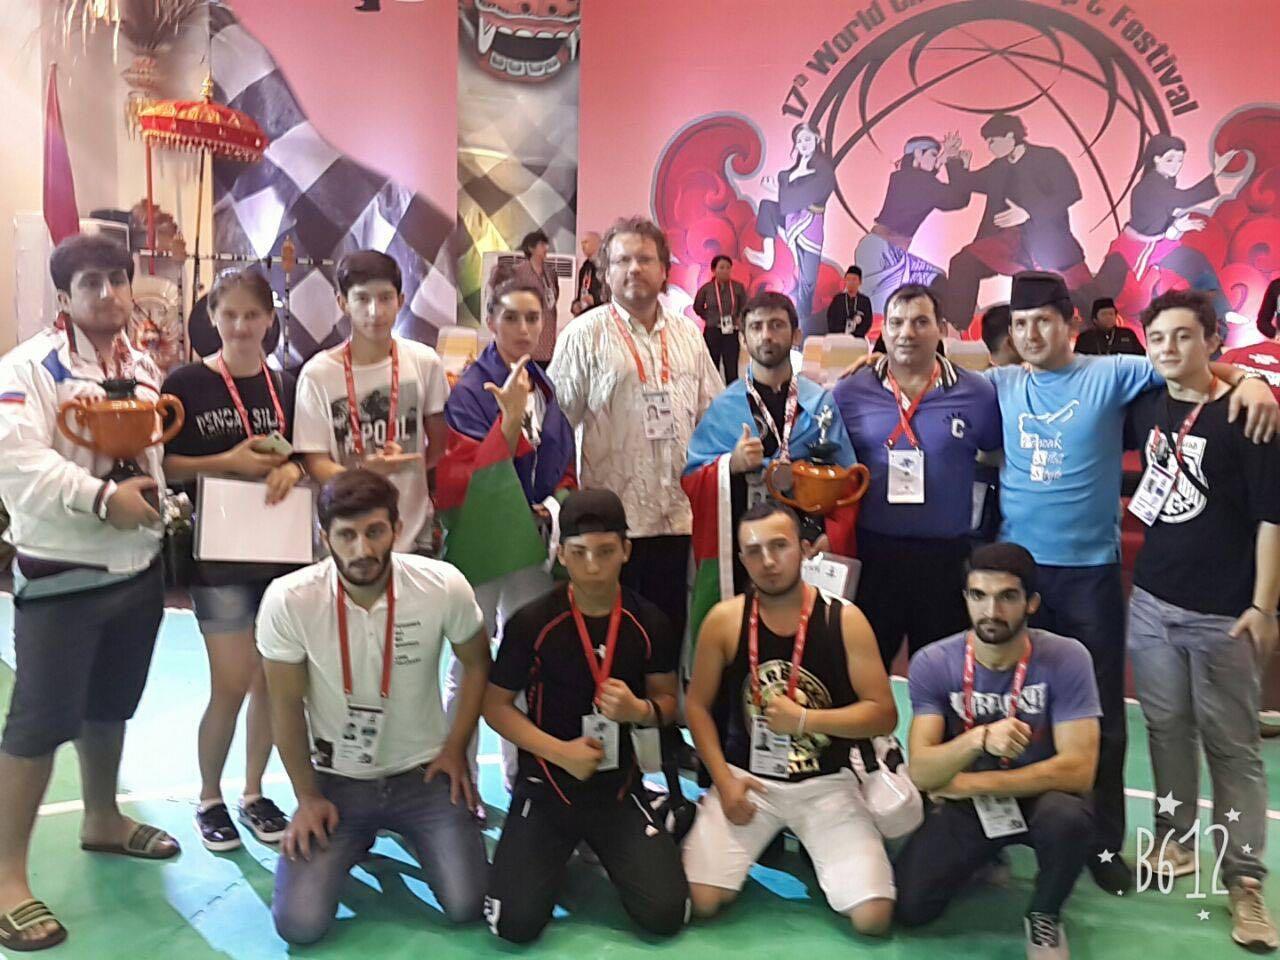 Delegasi Federasi Pencak Silat Rusia pada Kejuaraan Dunia Pencak Silat di Bali, Desember 2016. Sumber: Lyaysana Burnasheva